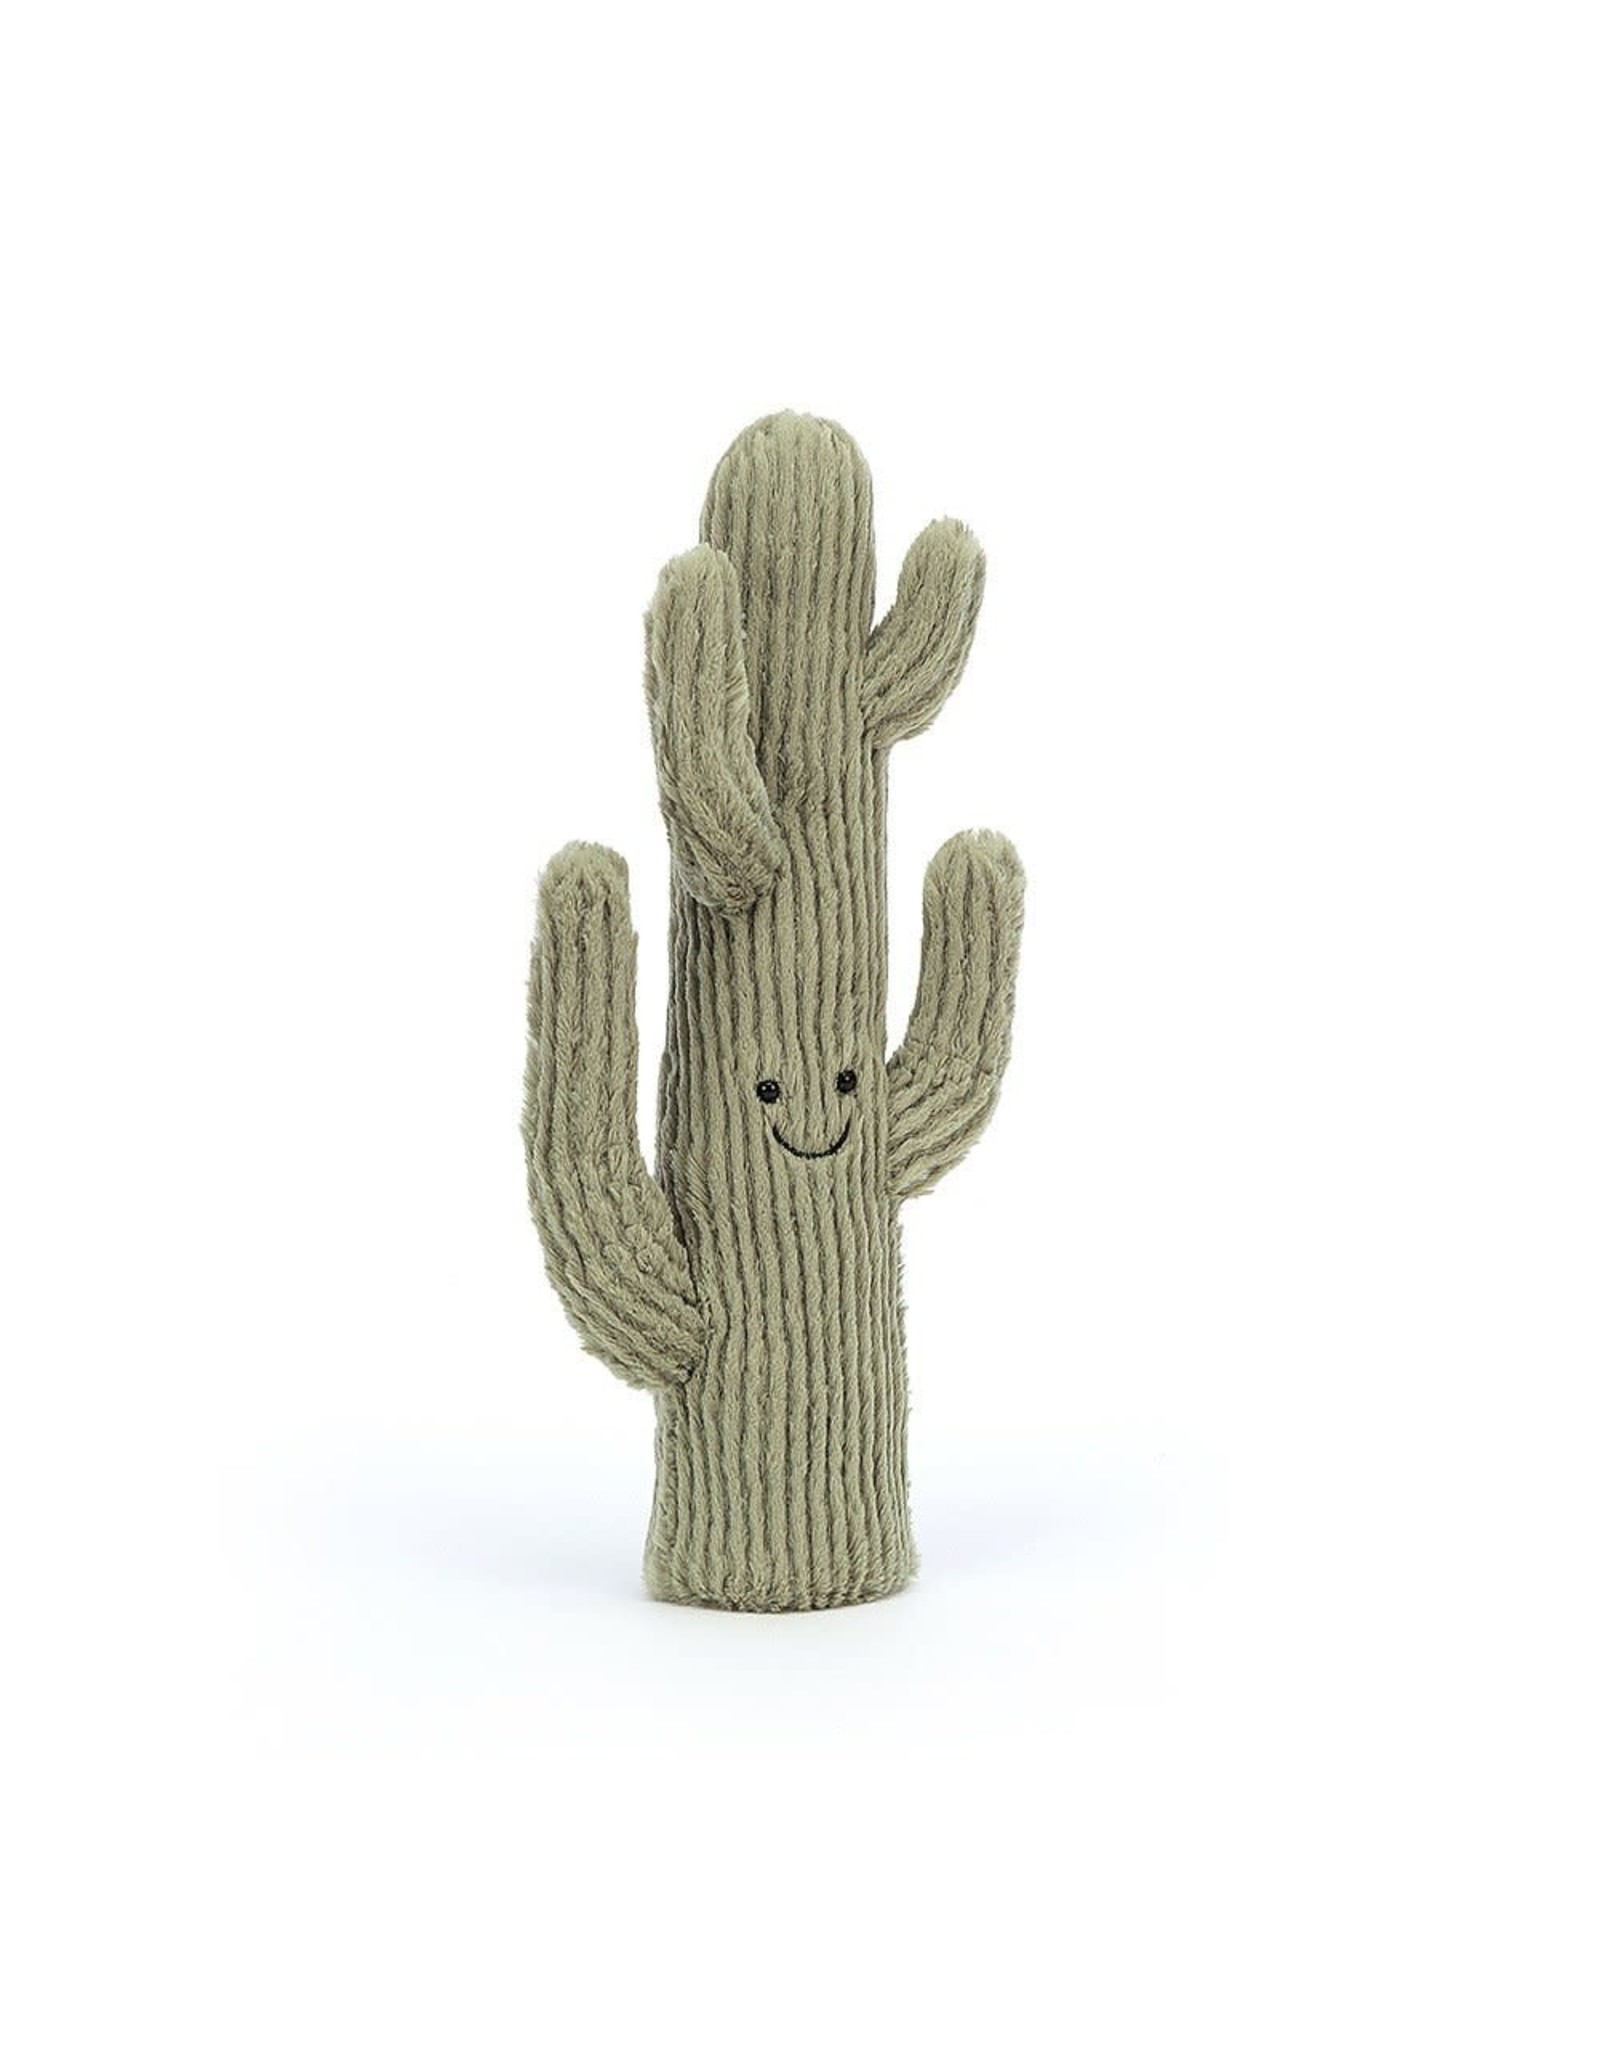 Jelly Cat Amuseable Desert Cactus, Large